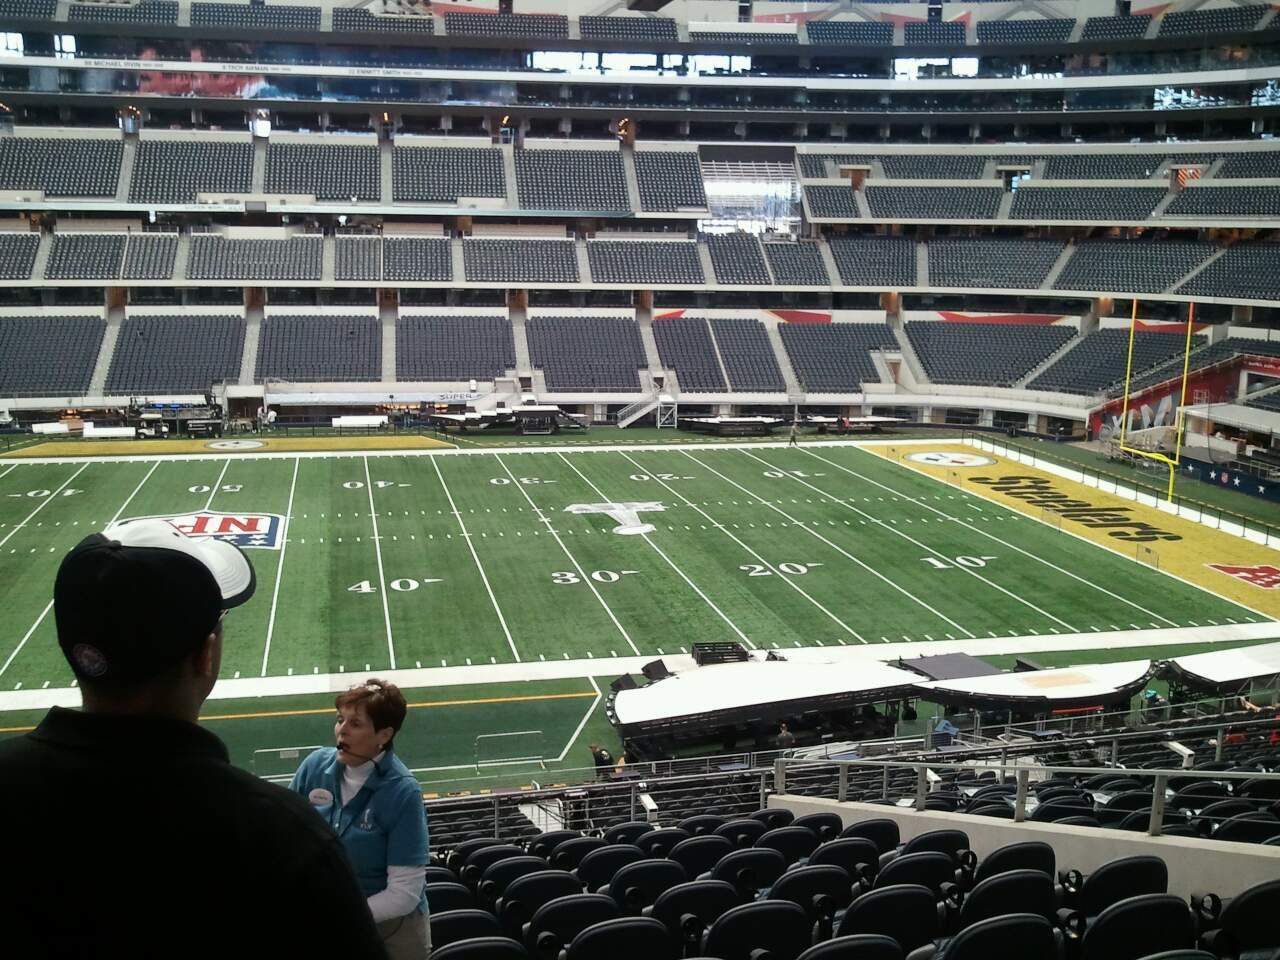 AT&T Stadium Section C210 Row 9 Seat 20